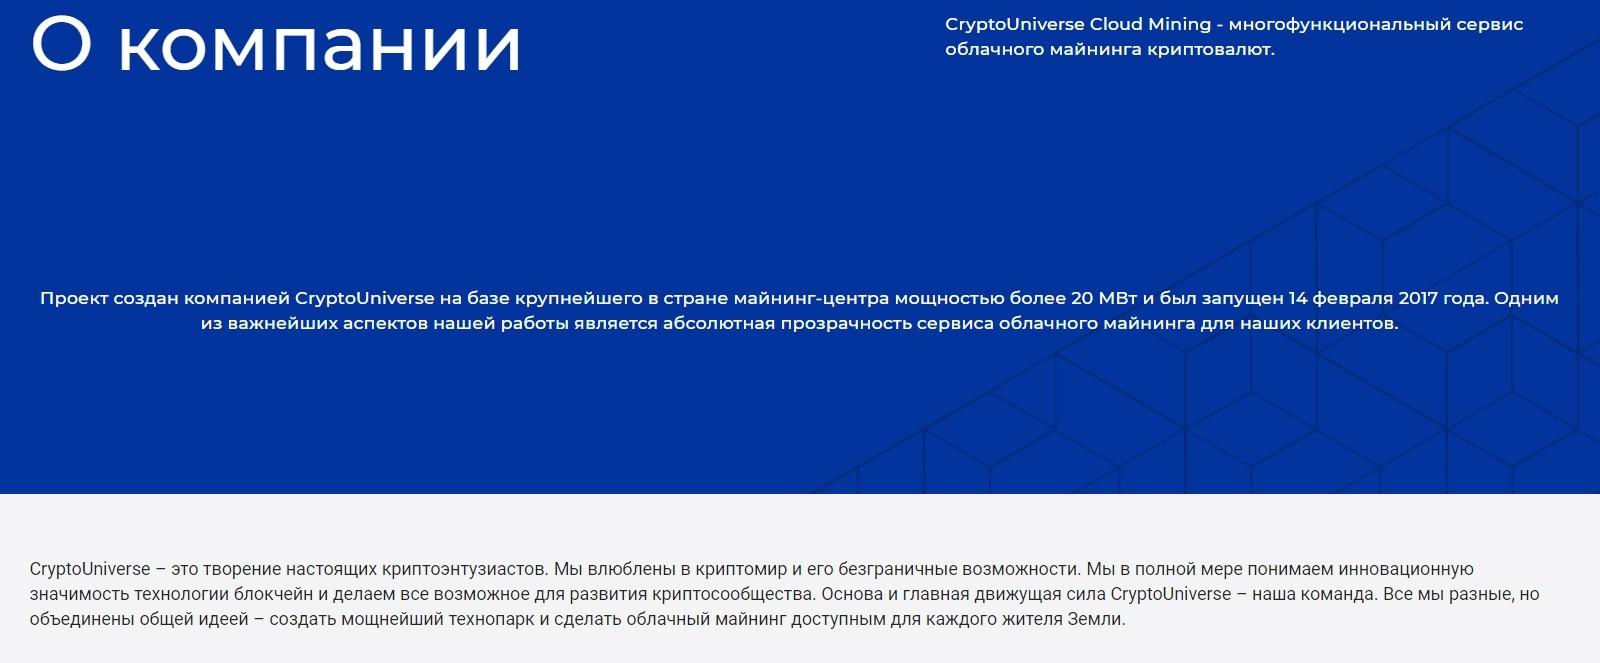 О компании Cryptouniverse